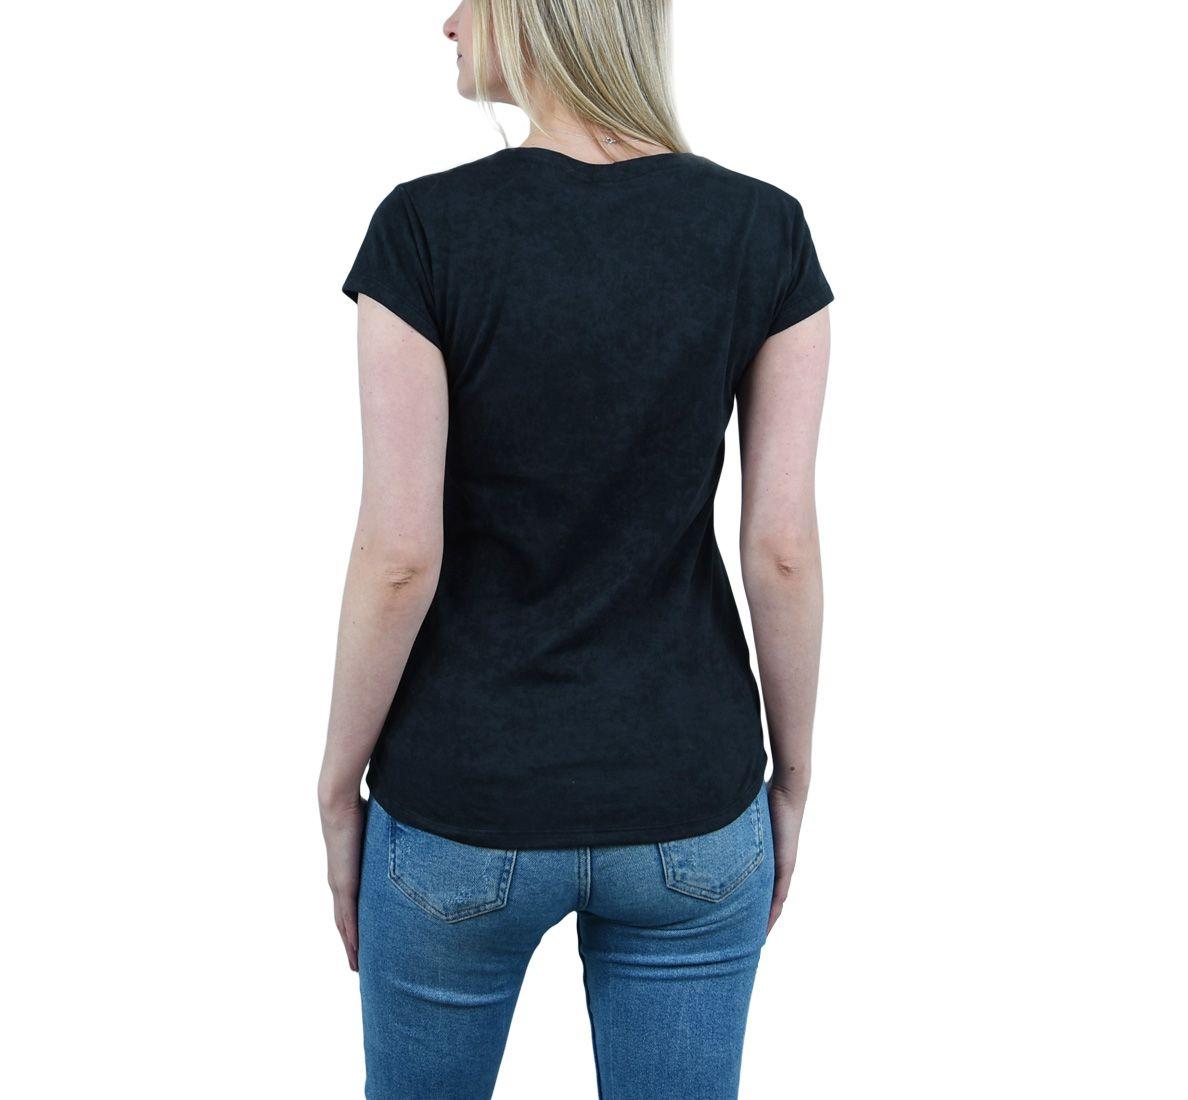 Camiseta Carbon Fem - Preto - Woom 247